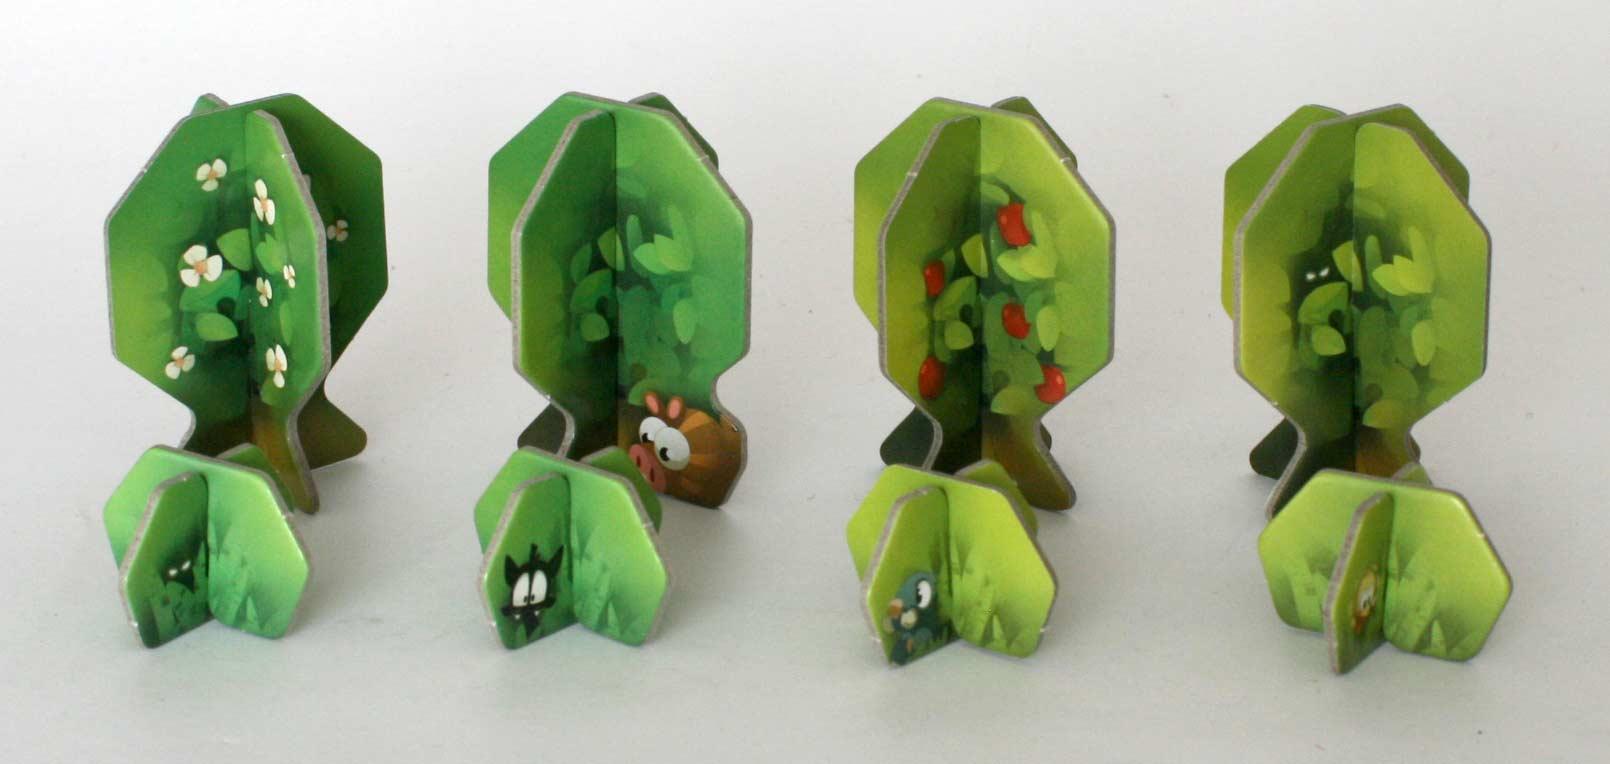 Krosmaster_02_arbres_buissons